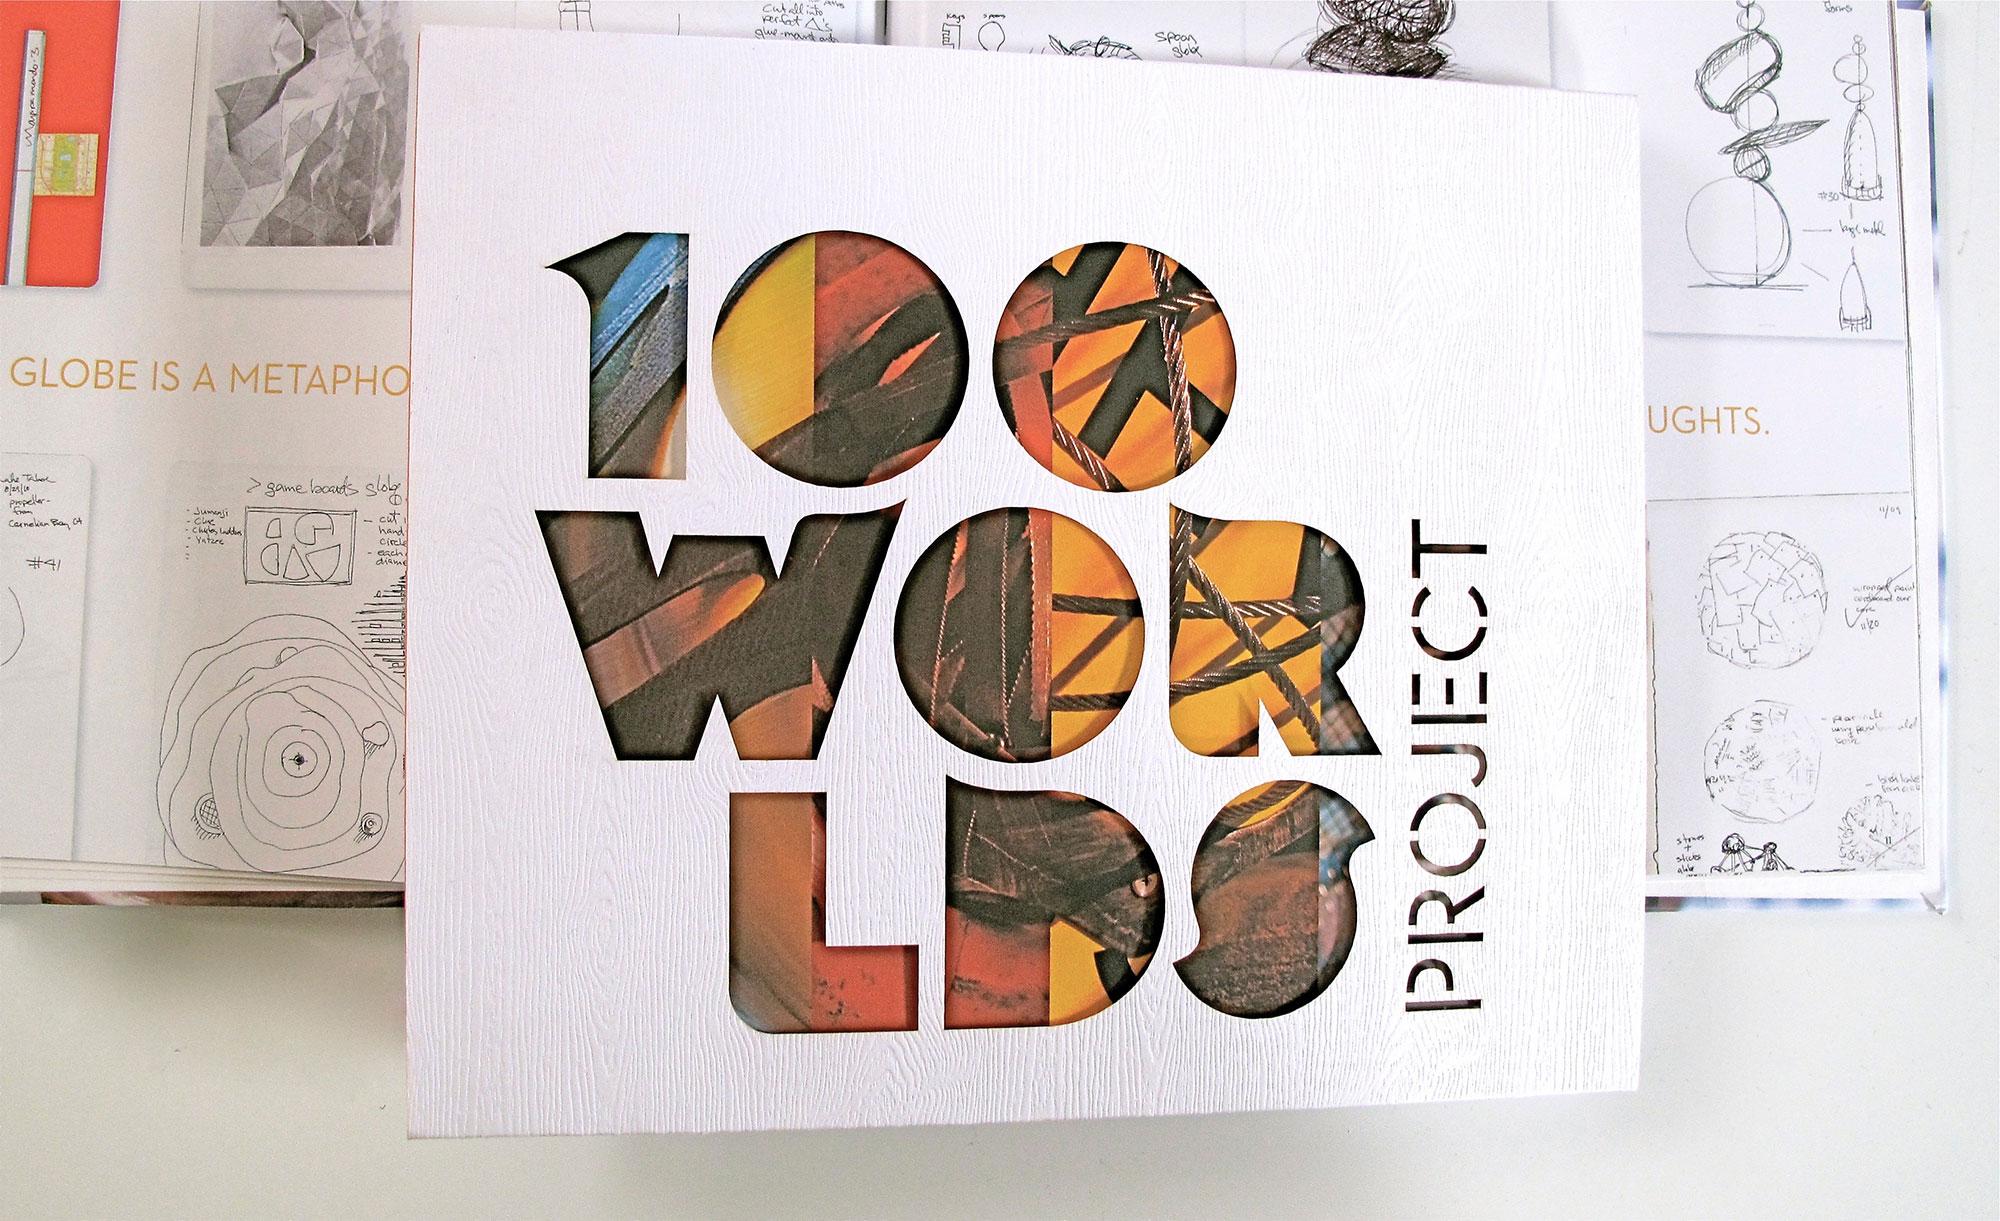 ron-miriello-grafico-san-diego-100-worlds-project-sculpture-globe-Miriello-branding-officina-07.jpg